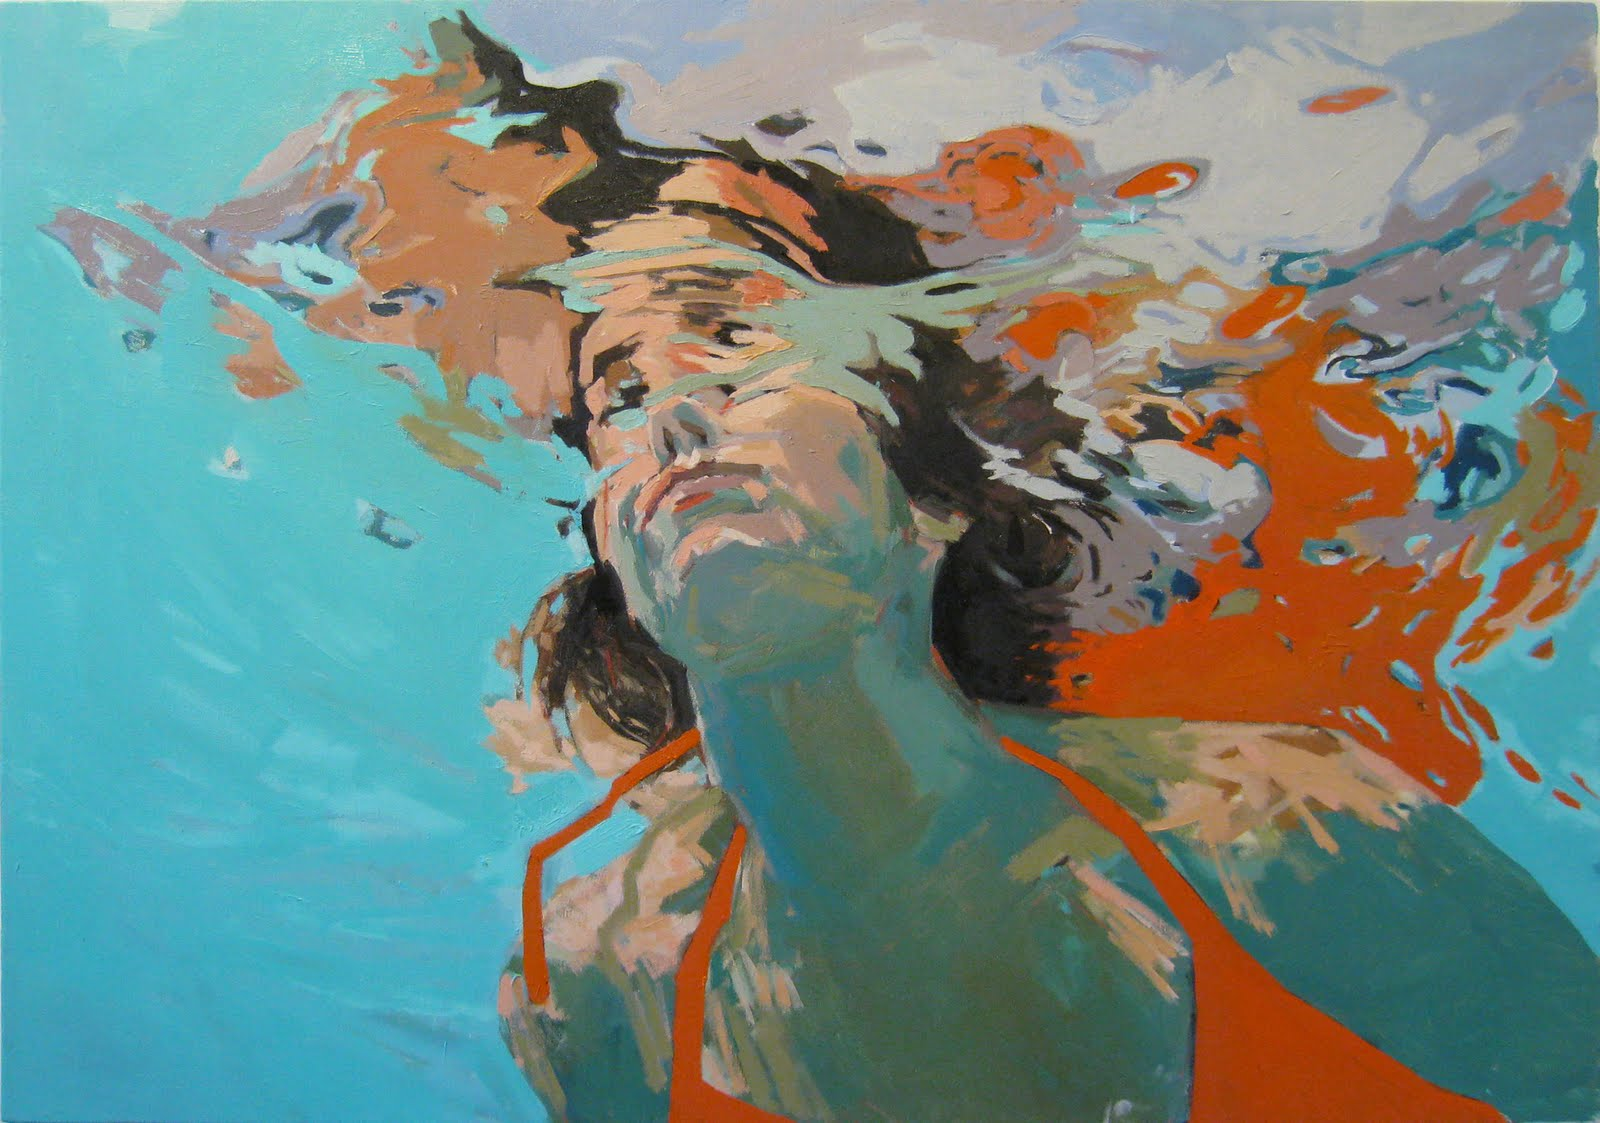 underwater painting of people by houston - 736×582